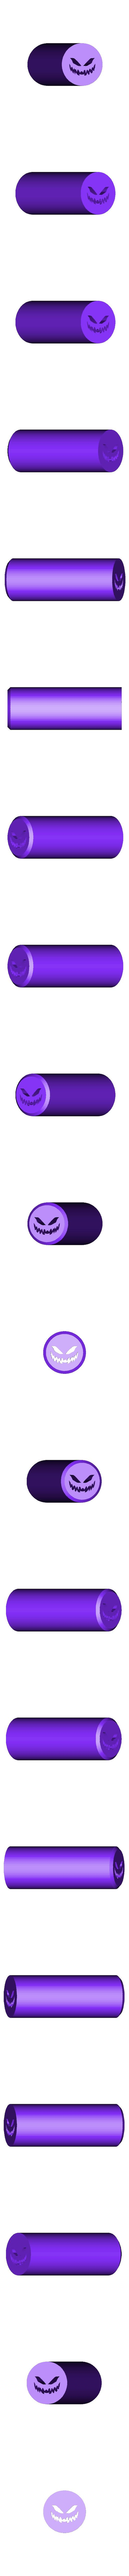 Filtro halloween face 3 v2.stl Download STL file FILTER TIPS - 89 FILTERS- ALL PACKS - WEED FILTER • 3D printer model, Weed420House